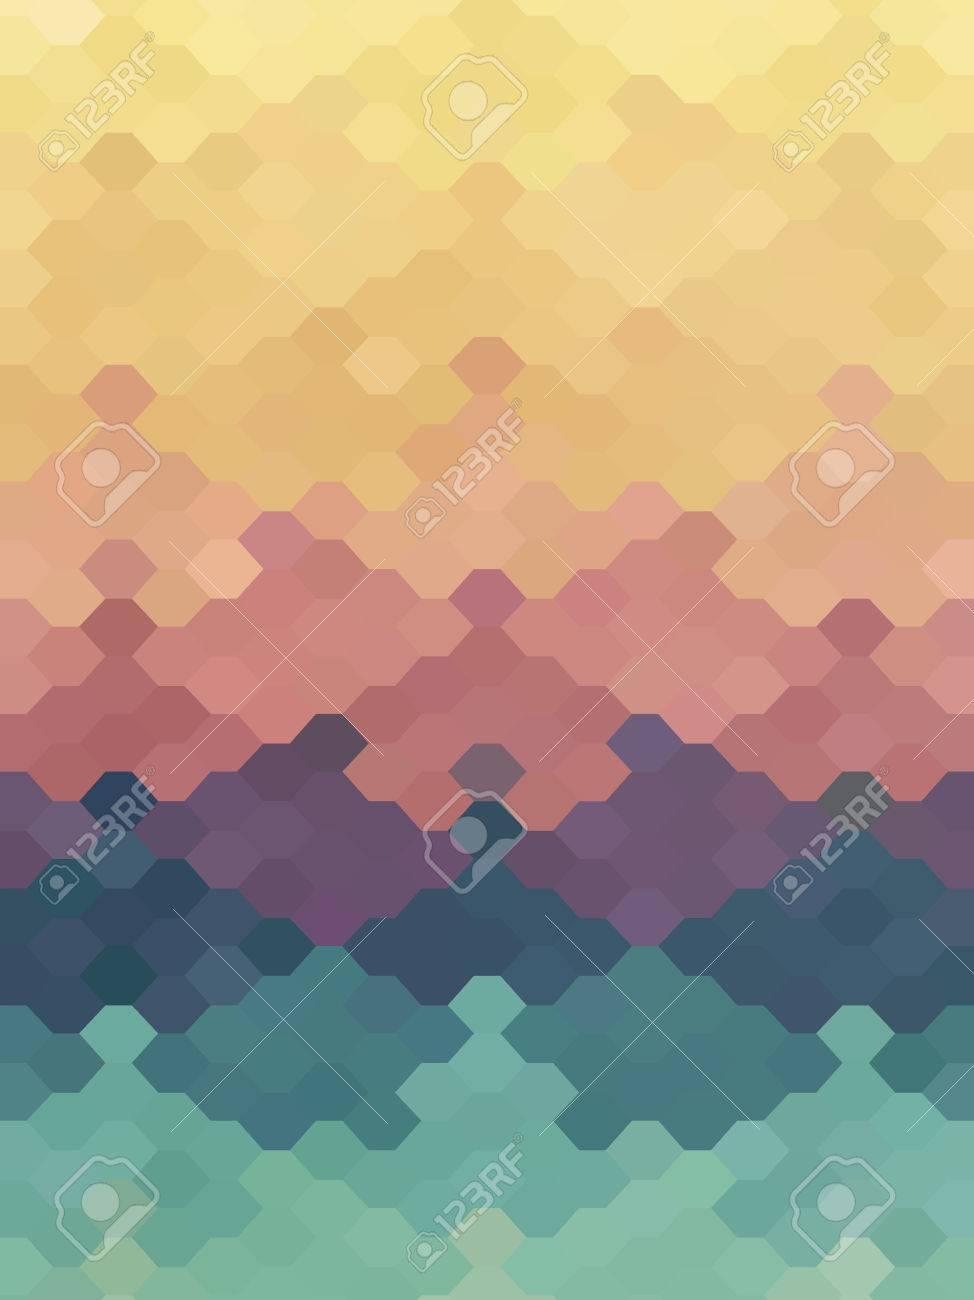 Abstract Jigsaw Puzzle Hexagon Pastel Color Wallpaper Stock Vector